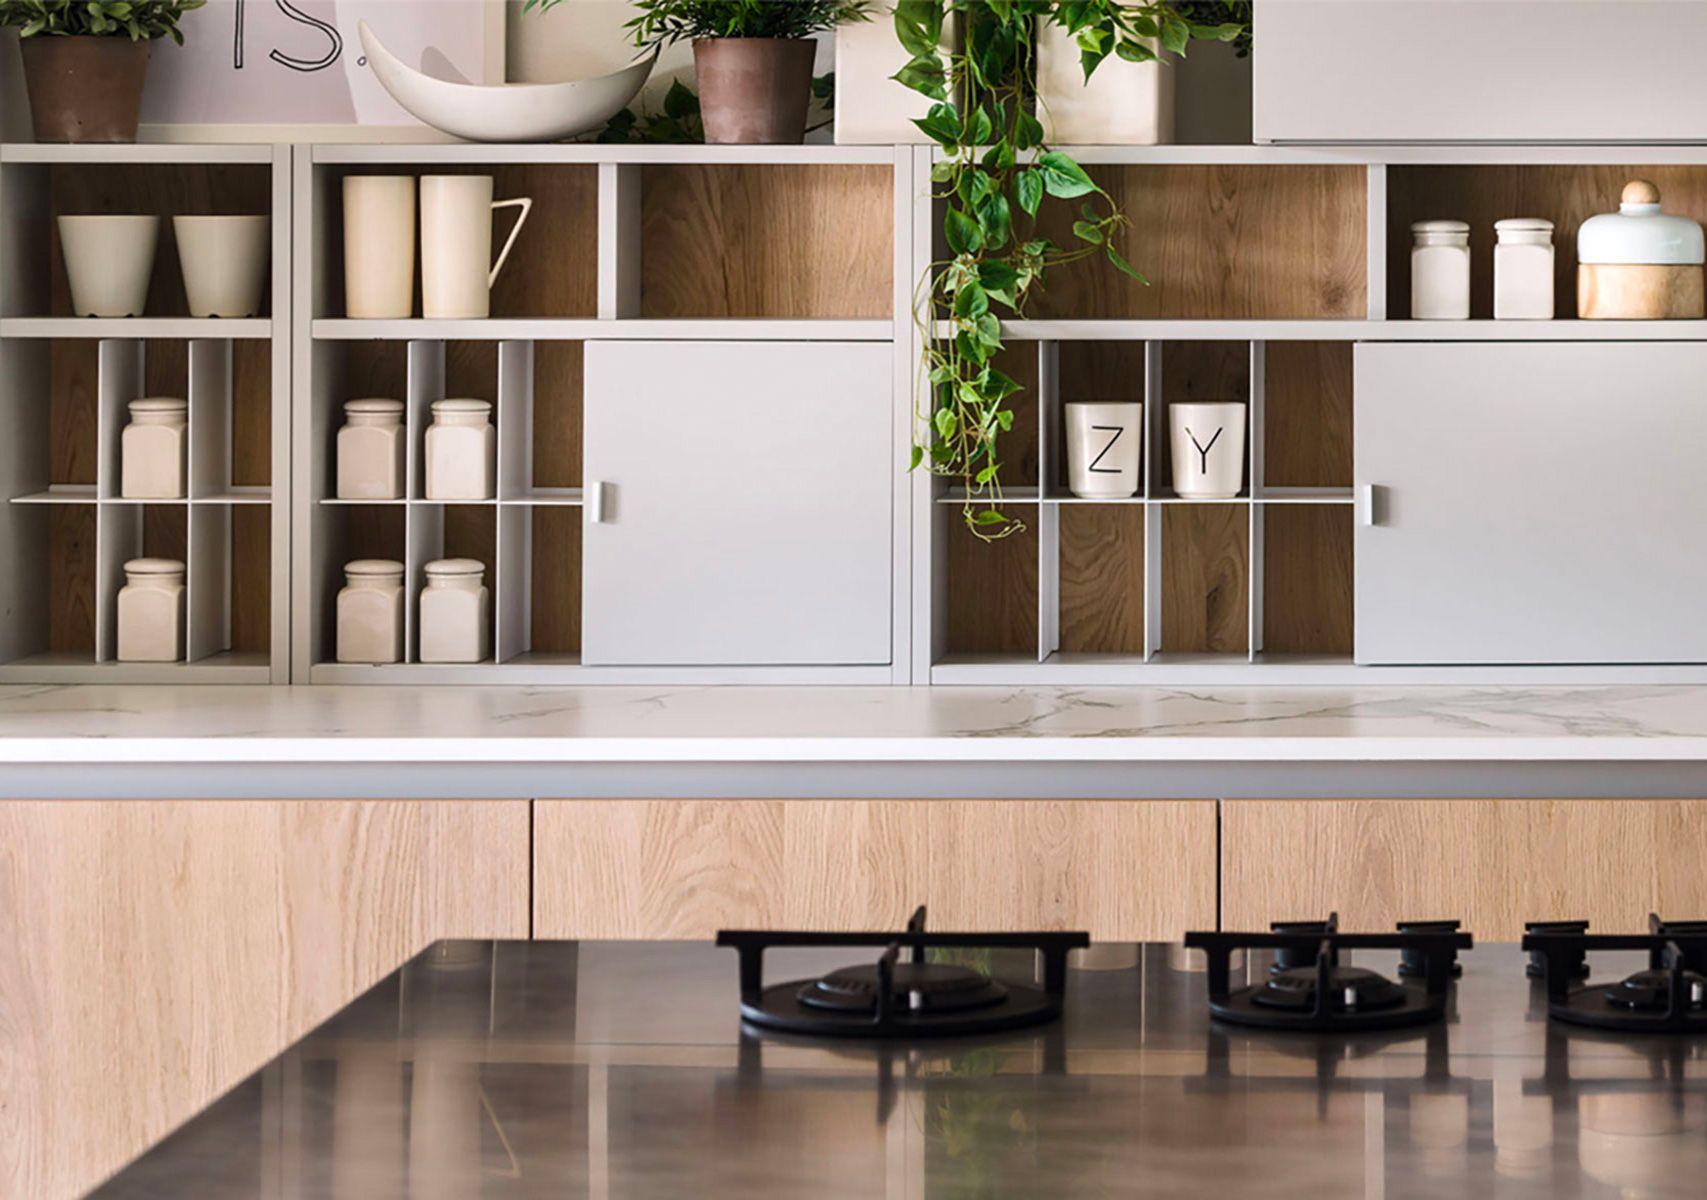 Binnenkijker Joanna Laajisto : Zecchinon cuisine pose et fabrication de cuisine haute qualité et